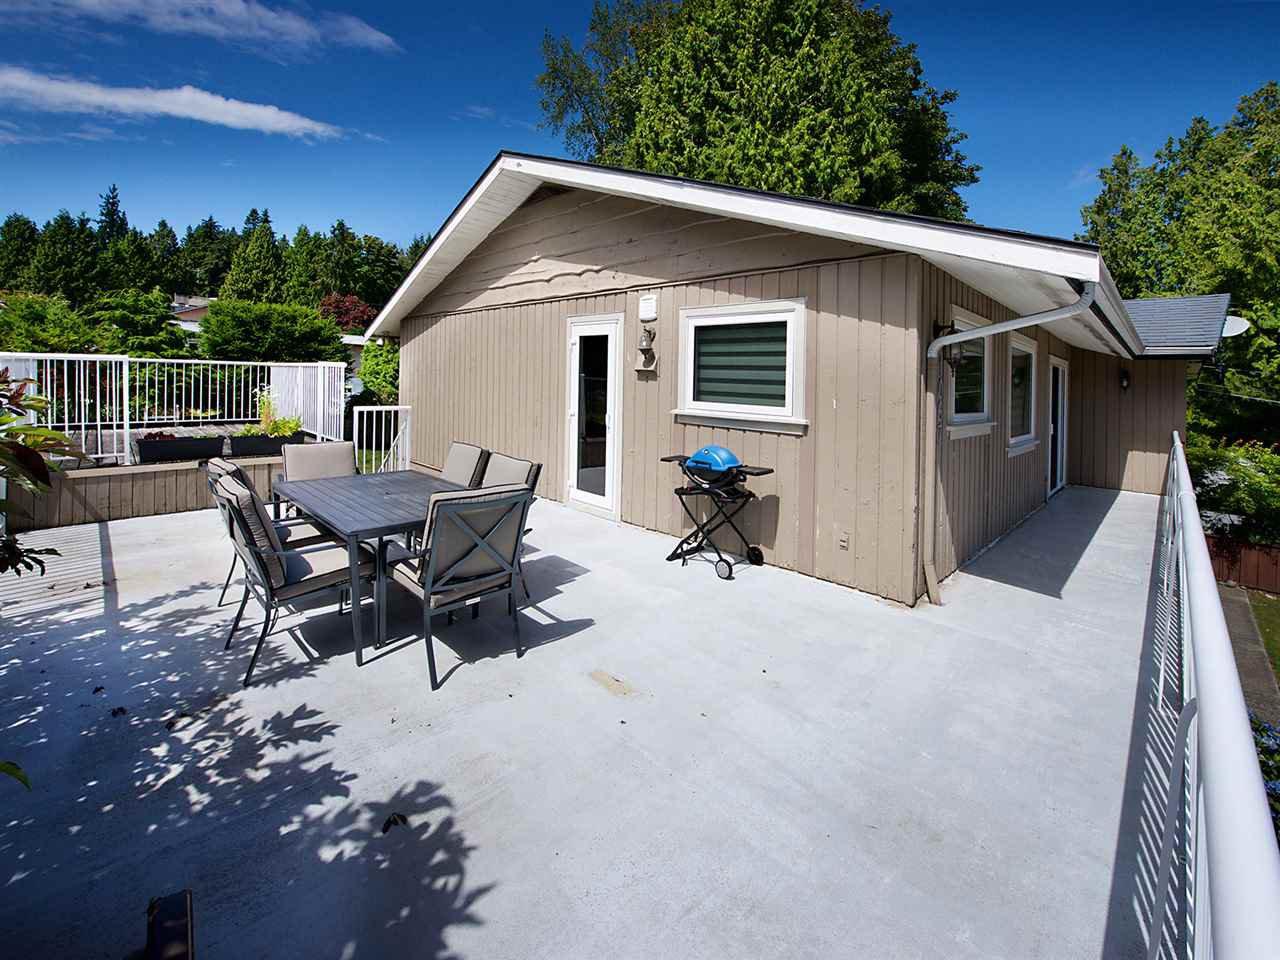 Photo 18: Photos: 1067 WILMINGTON Drive in Delta: Tsawwassen Central House for sale (Tsawwassen)  : MLS®# R2090180